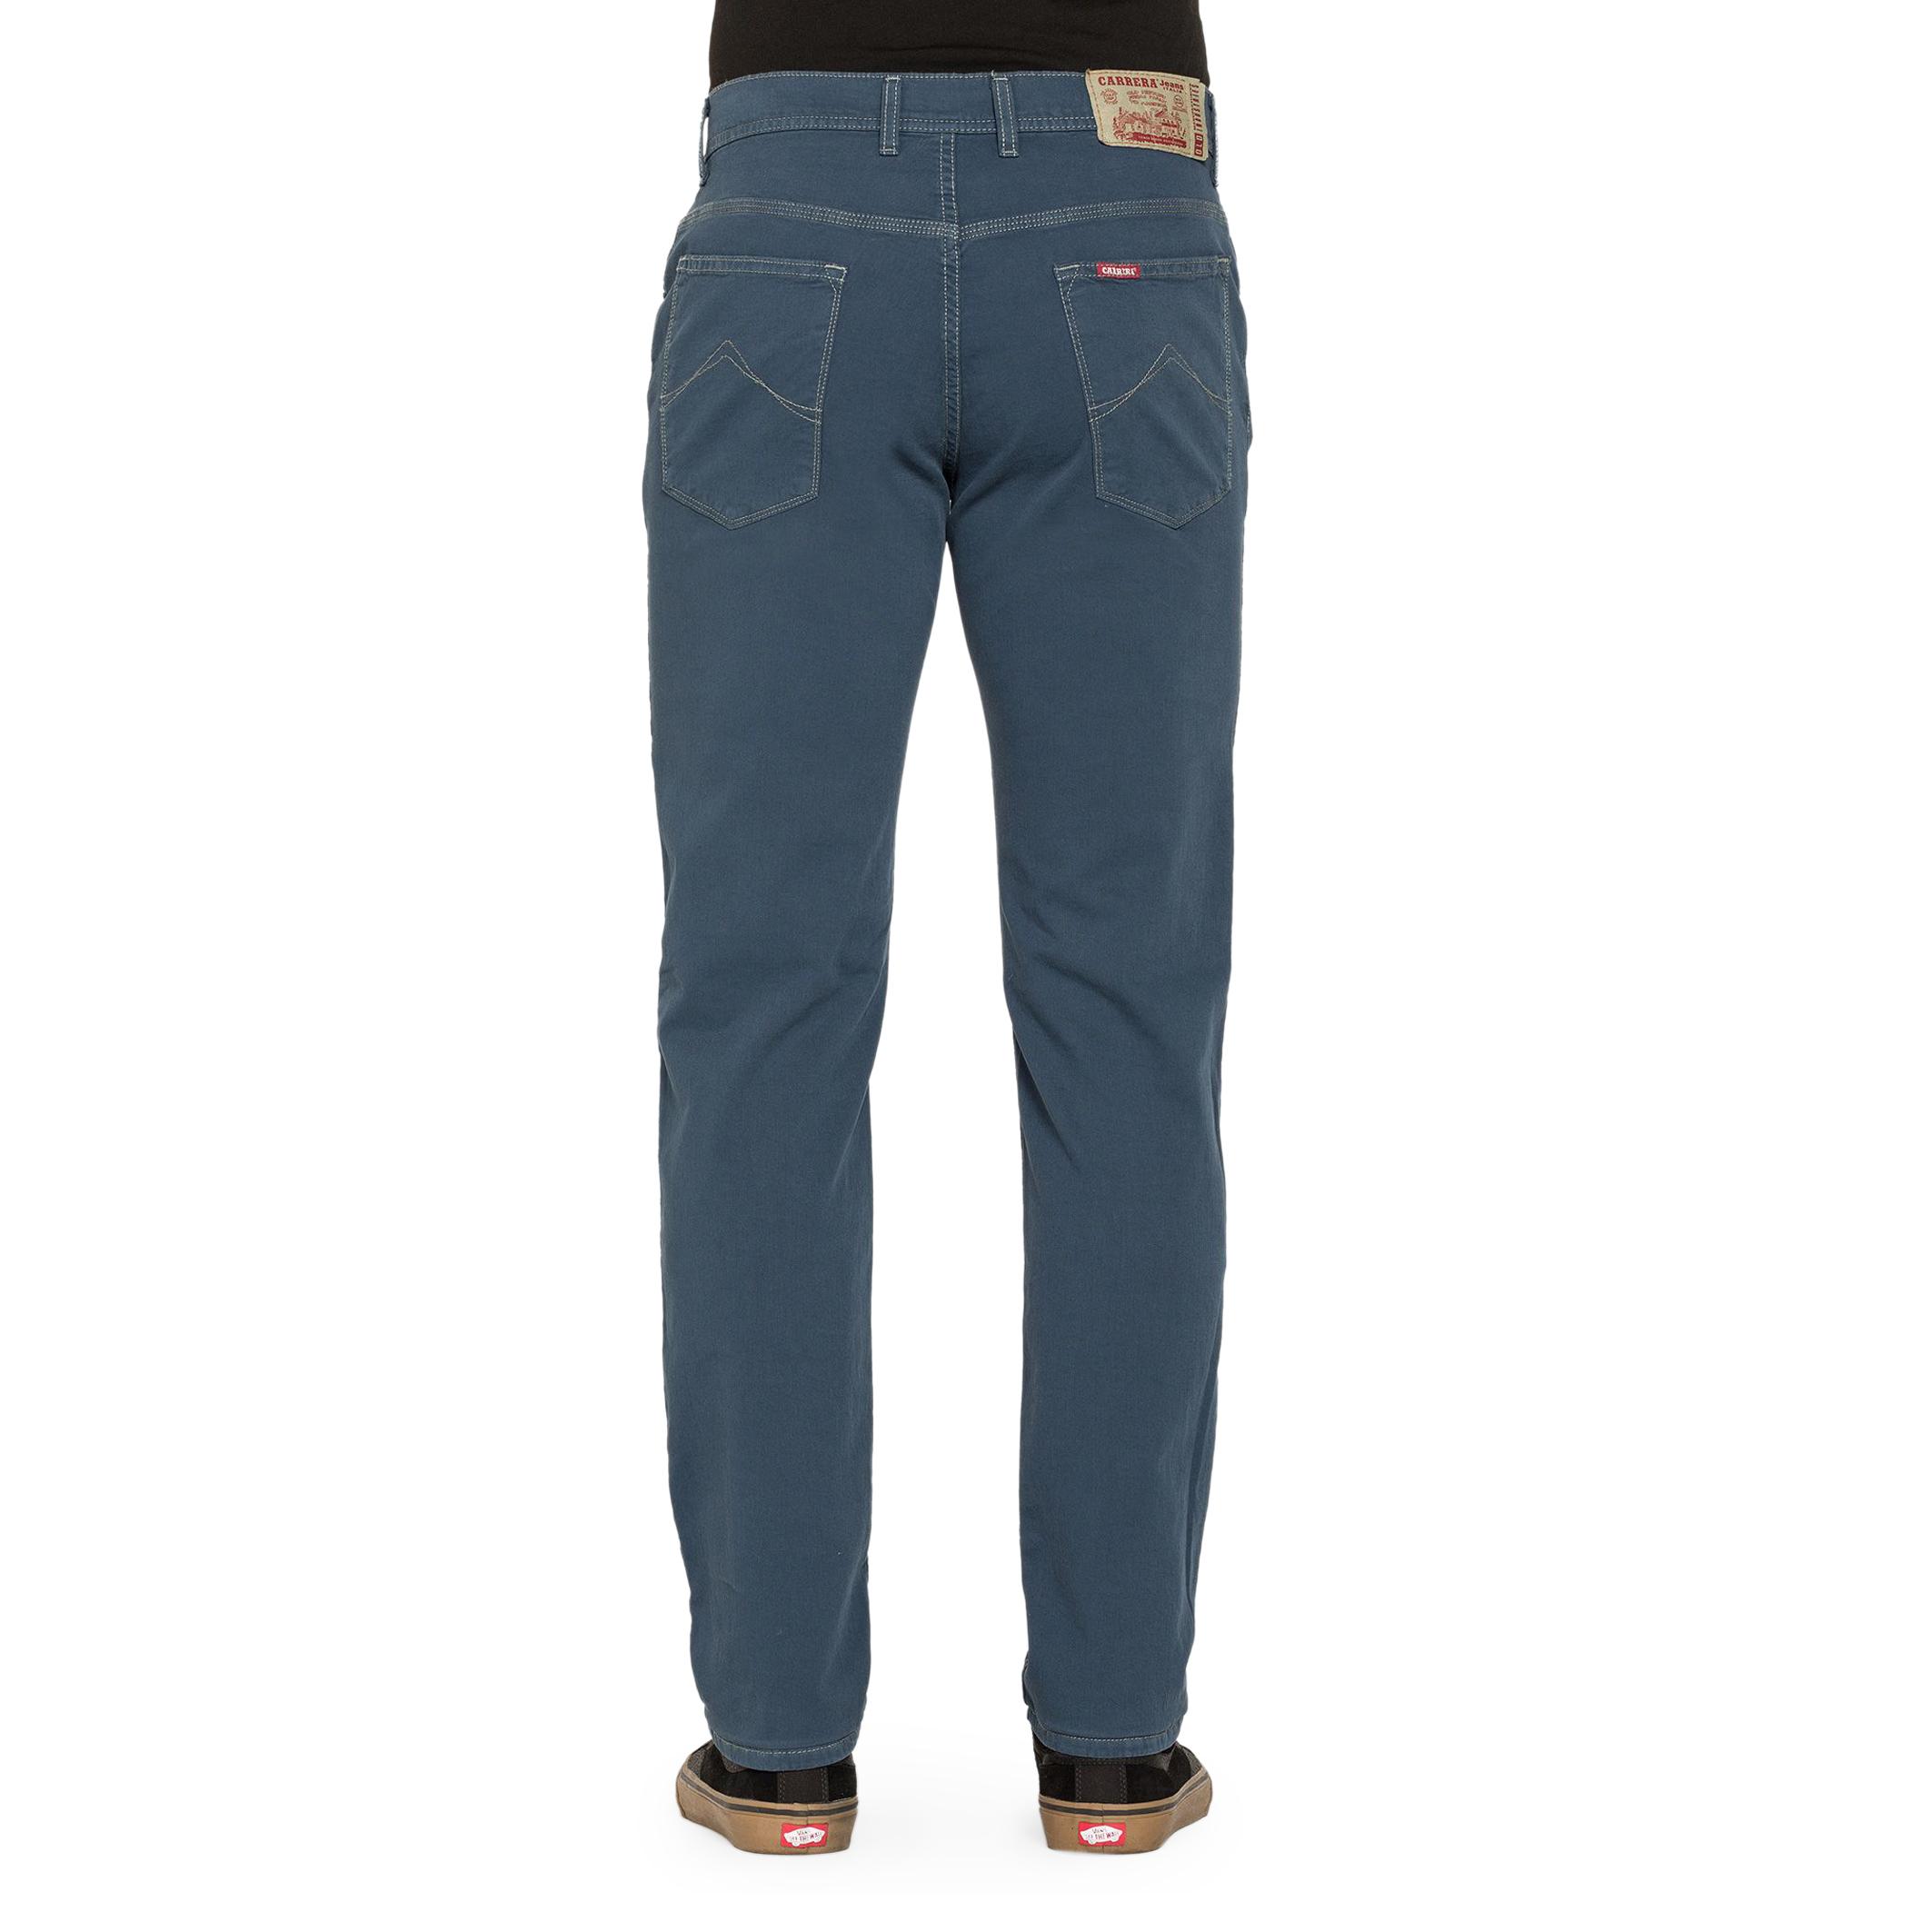 Carrera Jeans – 700-942A